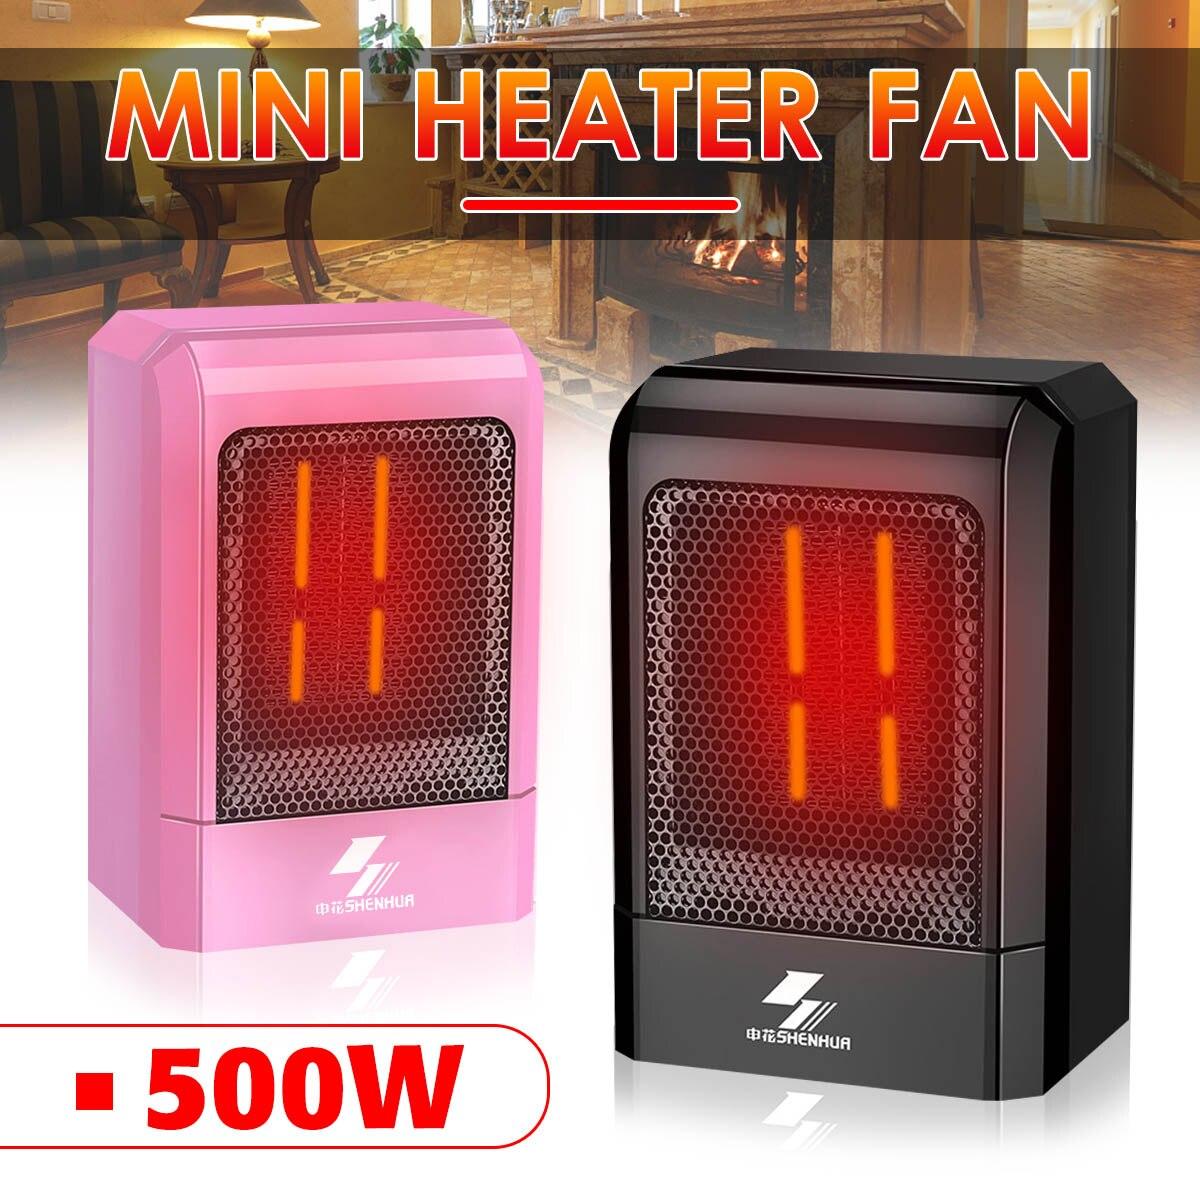 500W 220V Portable Electric Mini Fan Space Heater Winter Warm Home Office Desk US Plug PTC Ceramic Heating Energy Saving 1